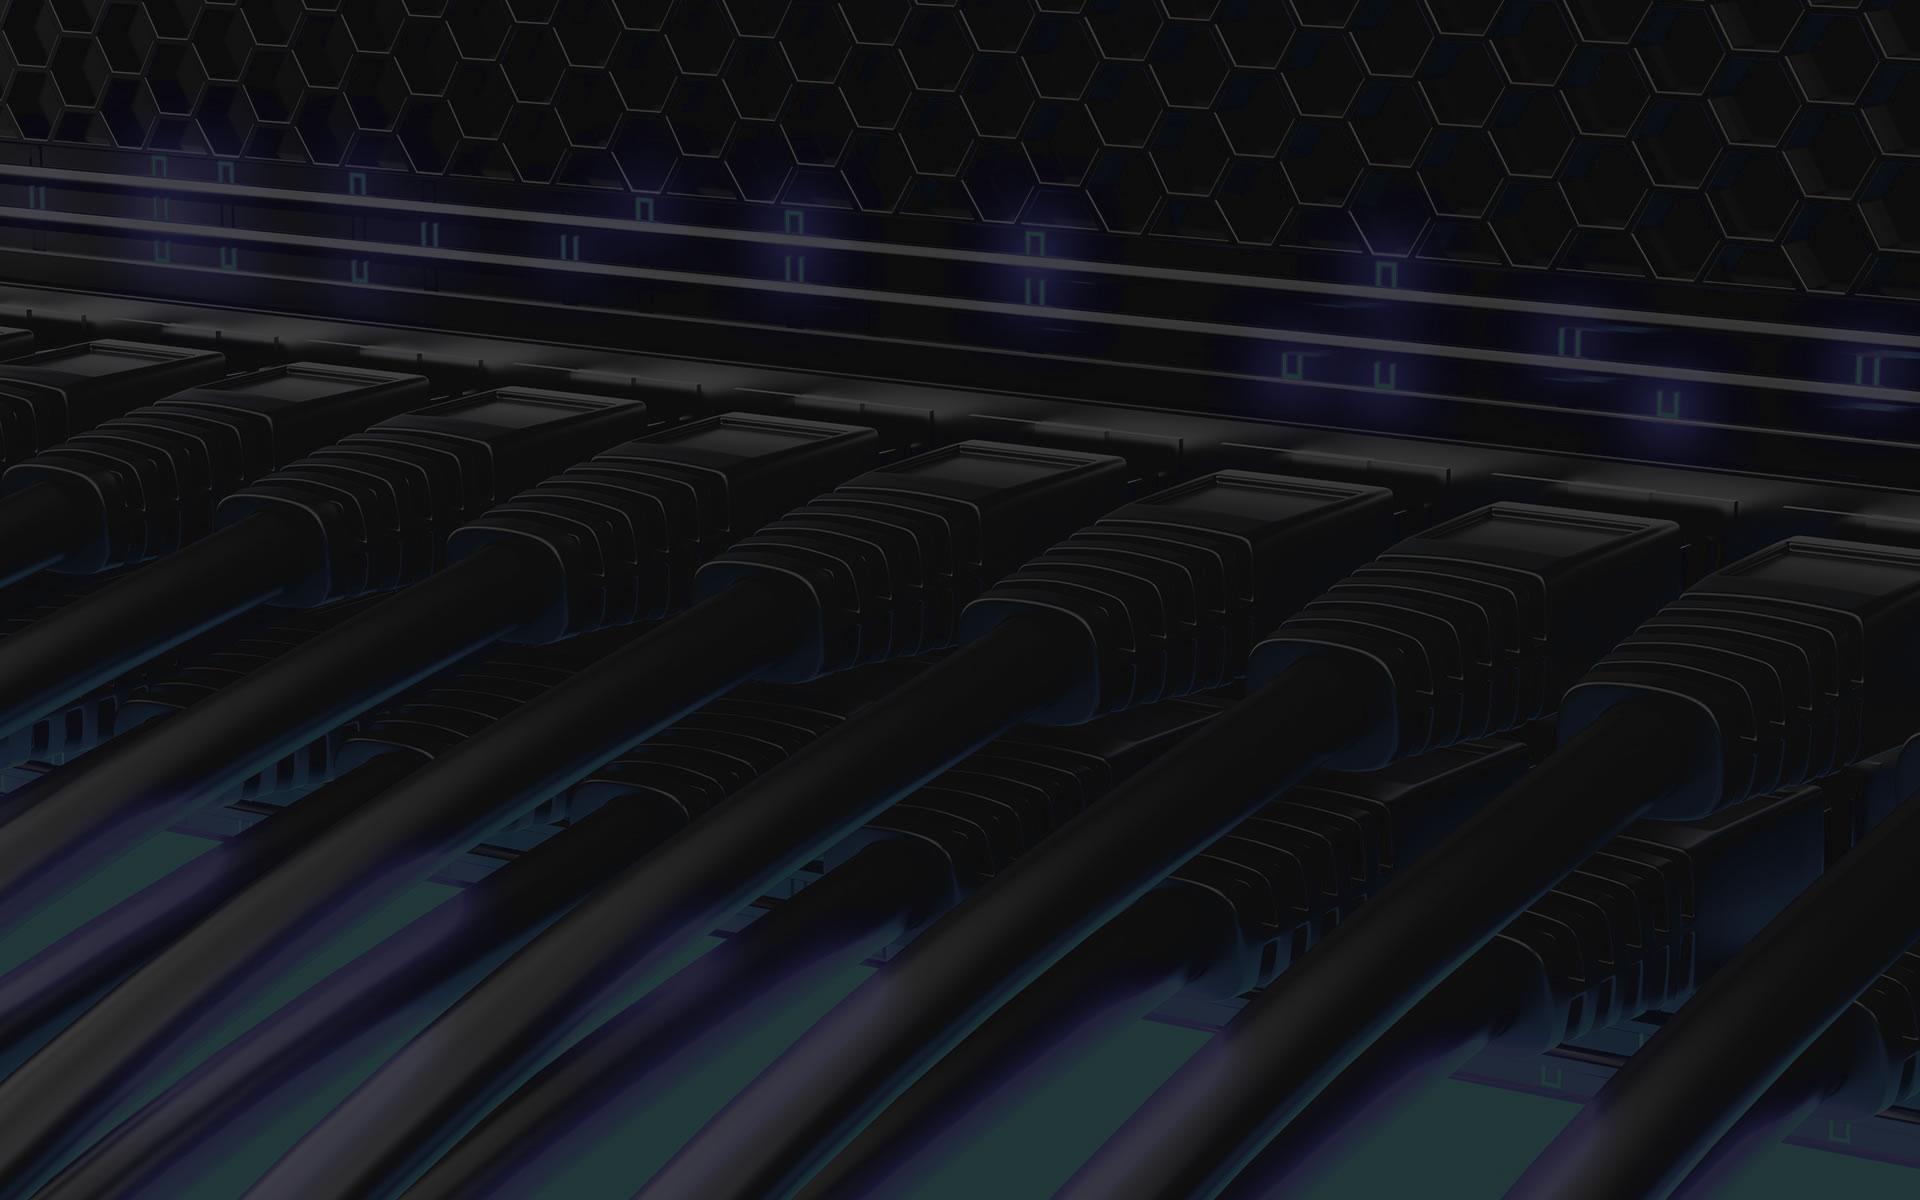 Services: hosting